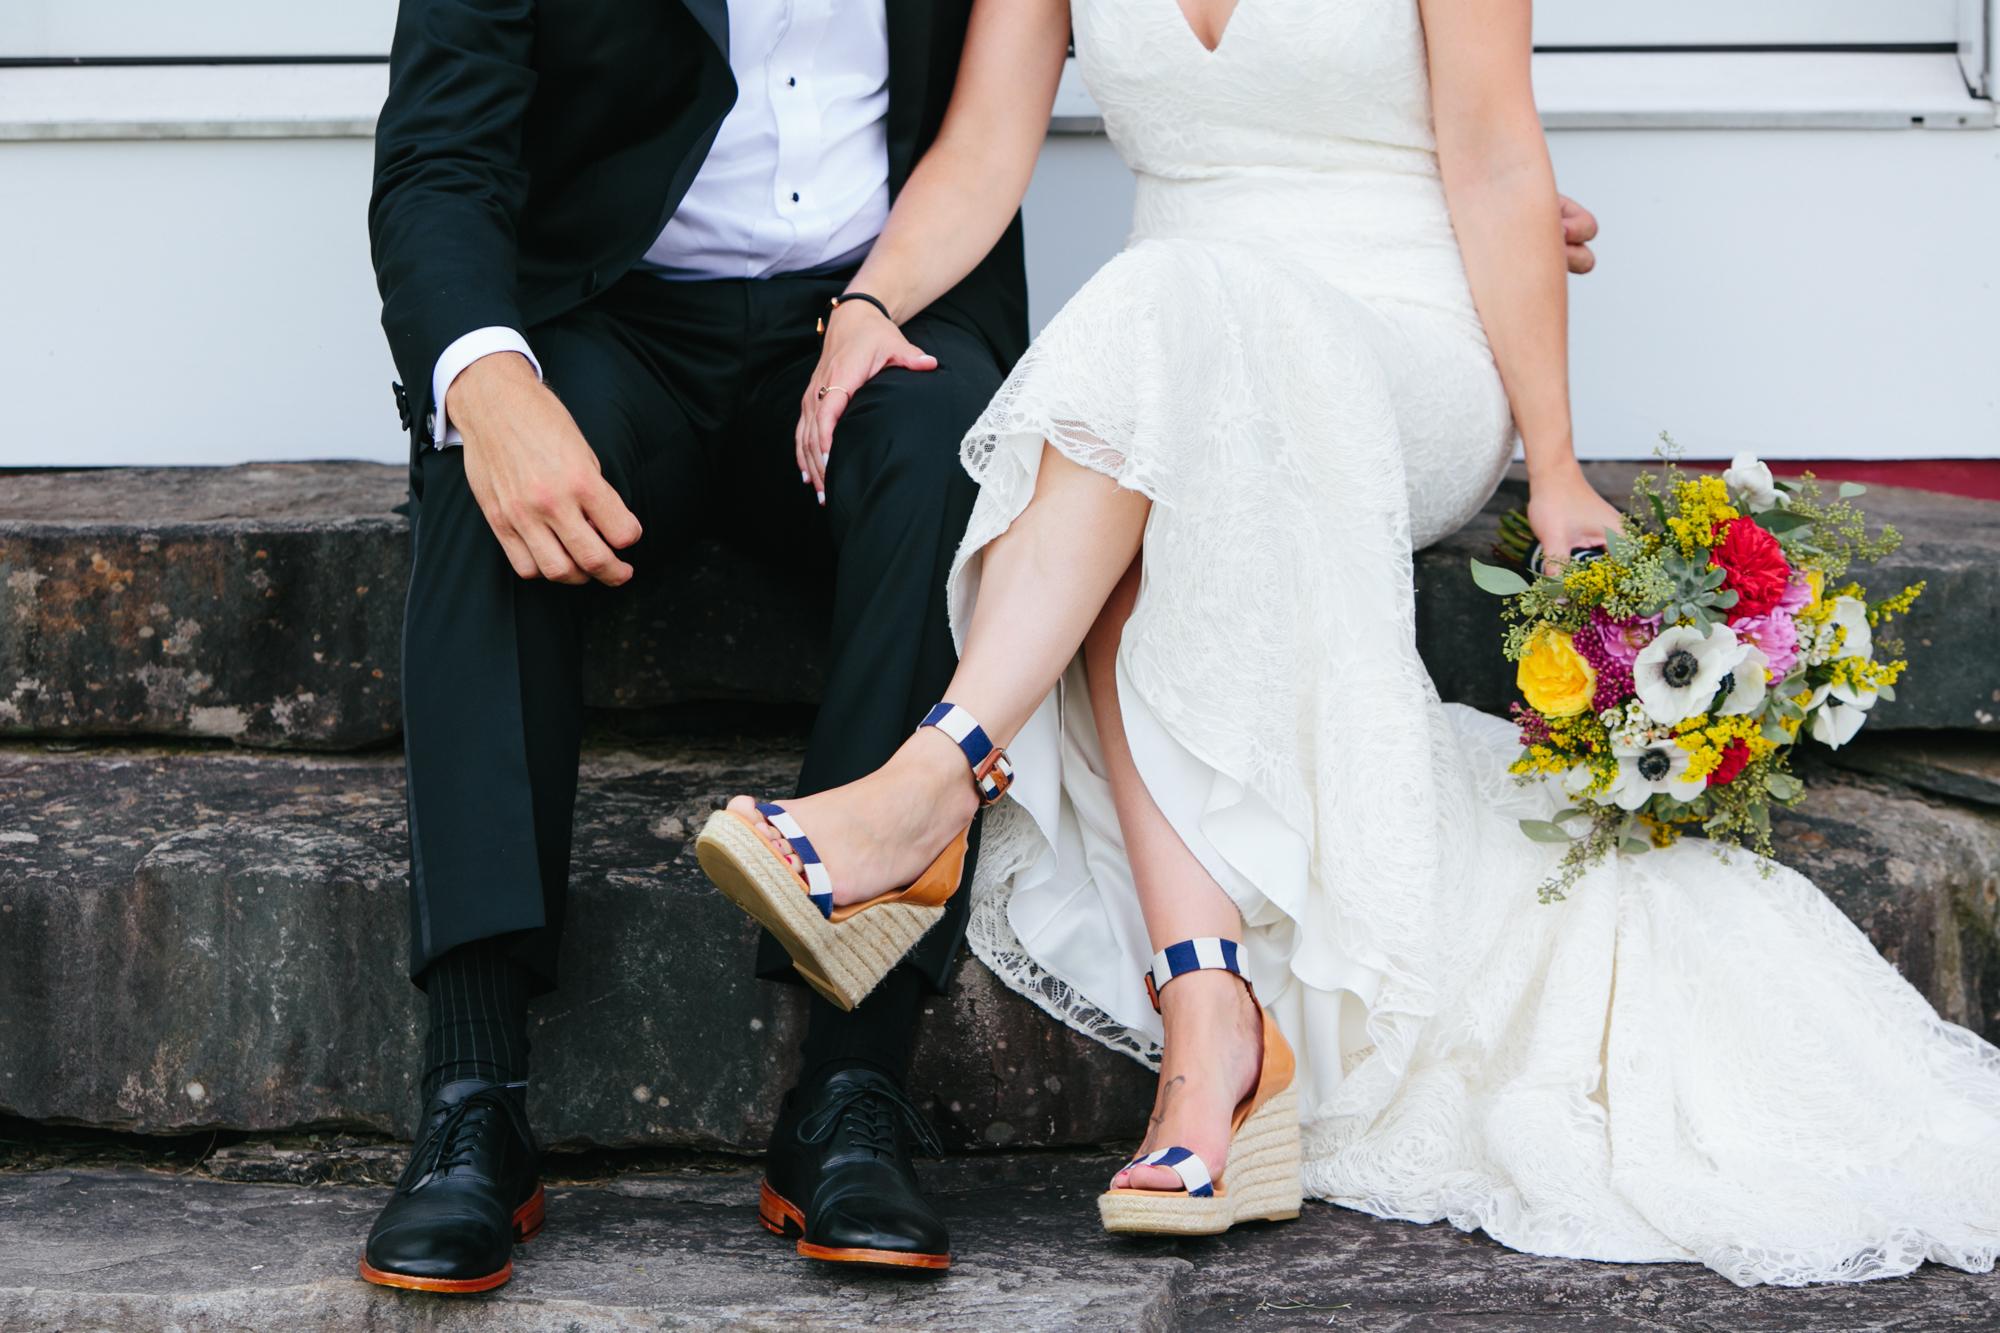 20150725_2015.07.25_SeelyCross_Wedding_website_UD9A6850 copy.jpg